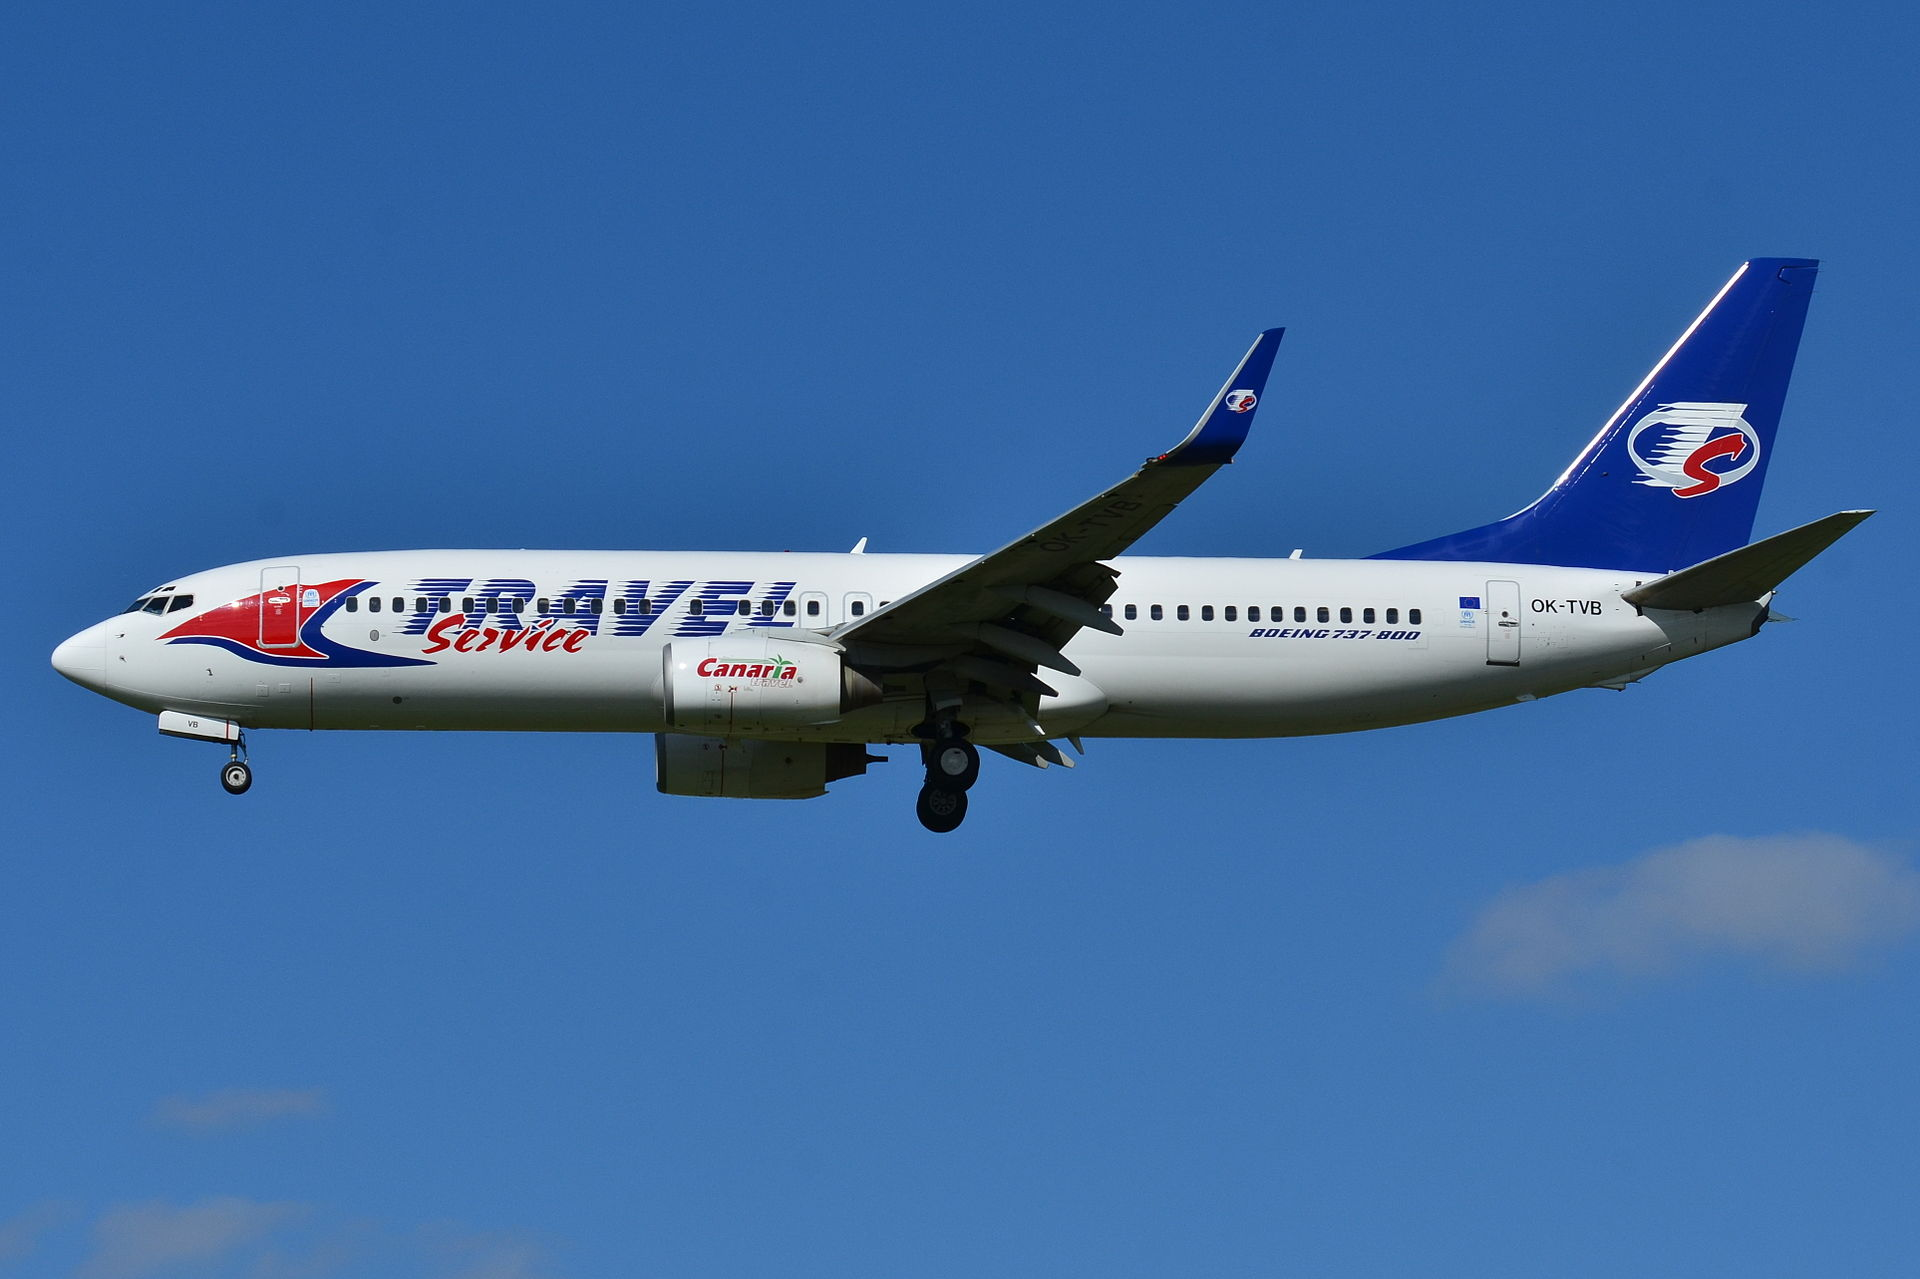 1920px-Boeing_737-800_Travel_Service_(TV